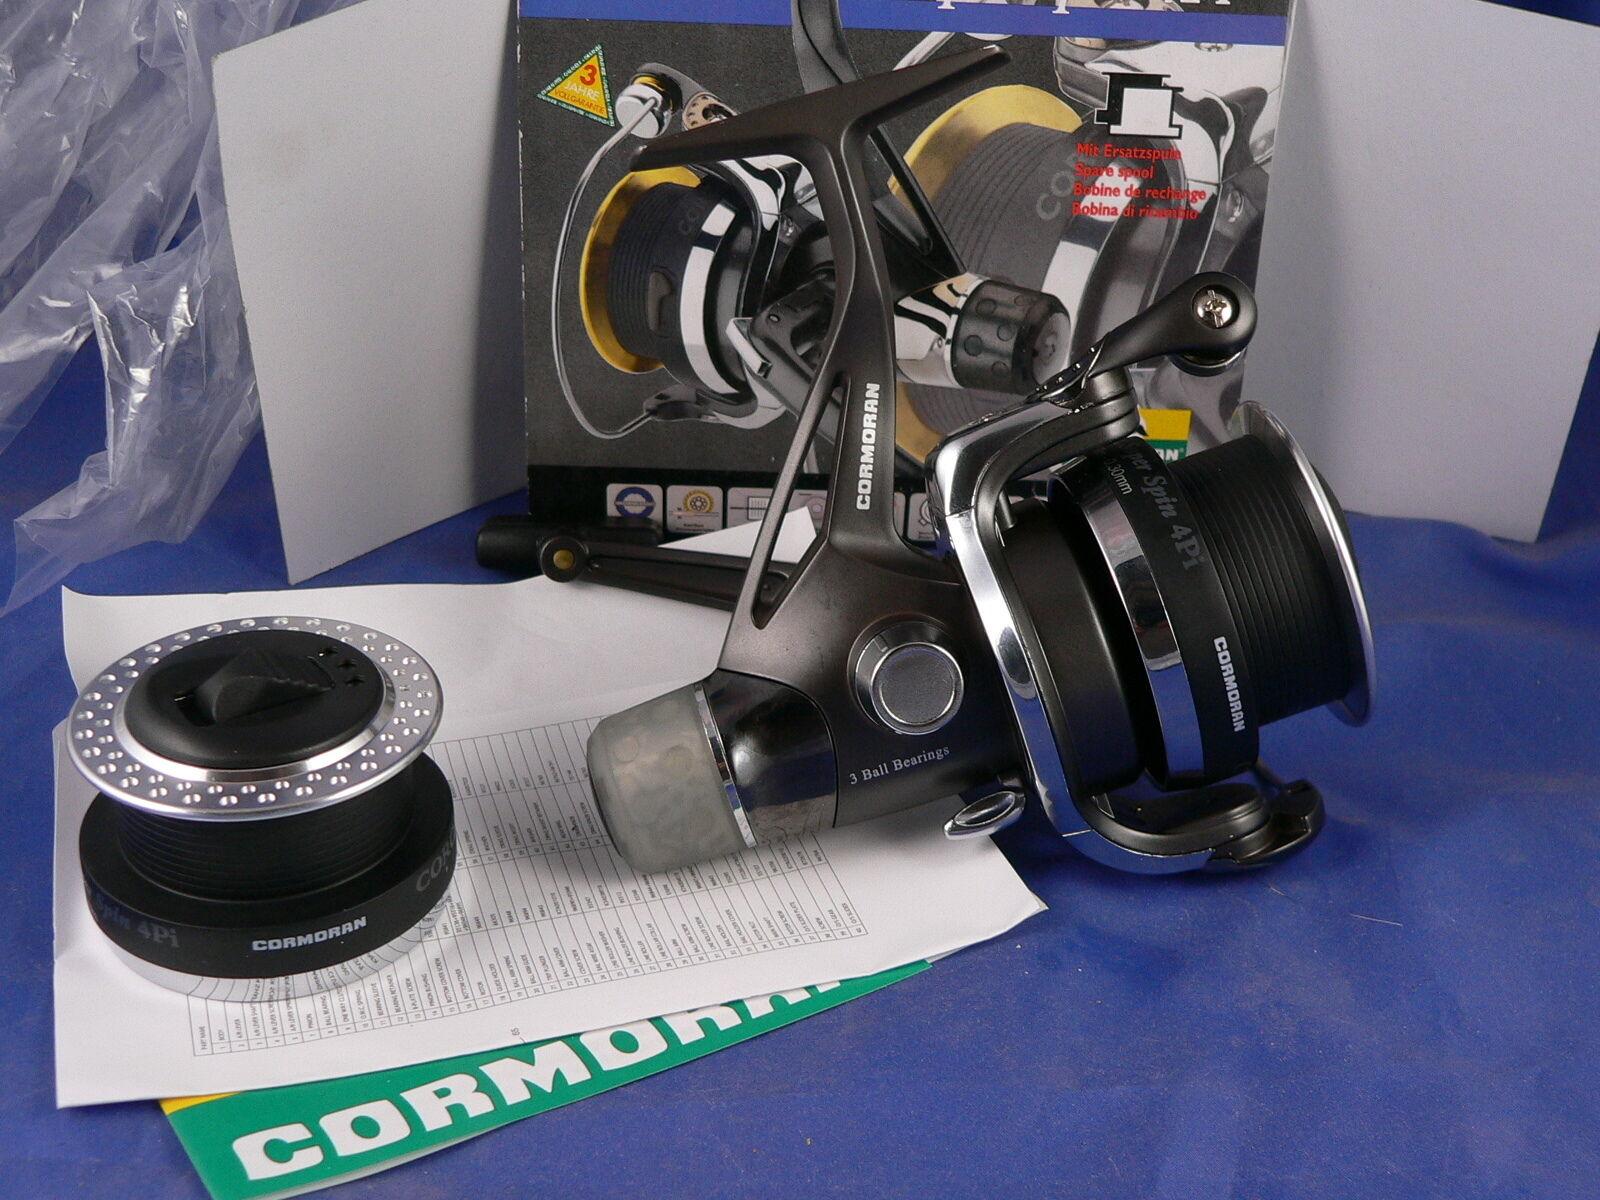 Angelrolle Corcast Cormoran Corcast Angelrolle super Spin 4Pi,fischen ledgering,bolognesefischen, fd1aee